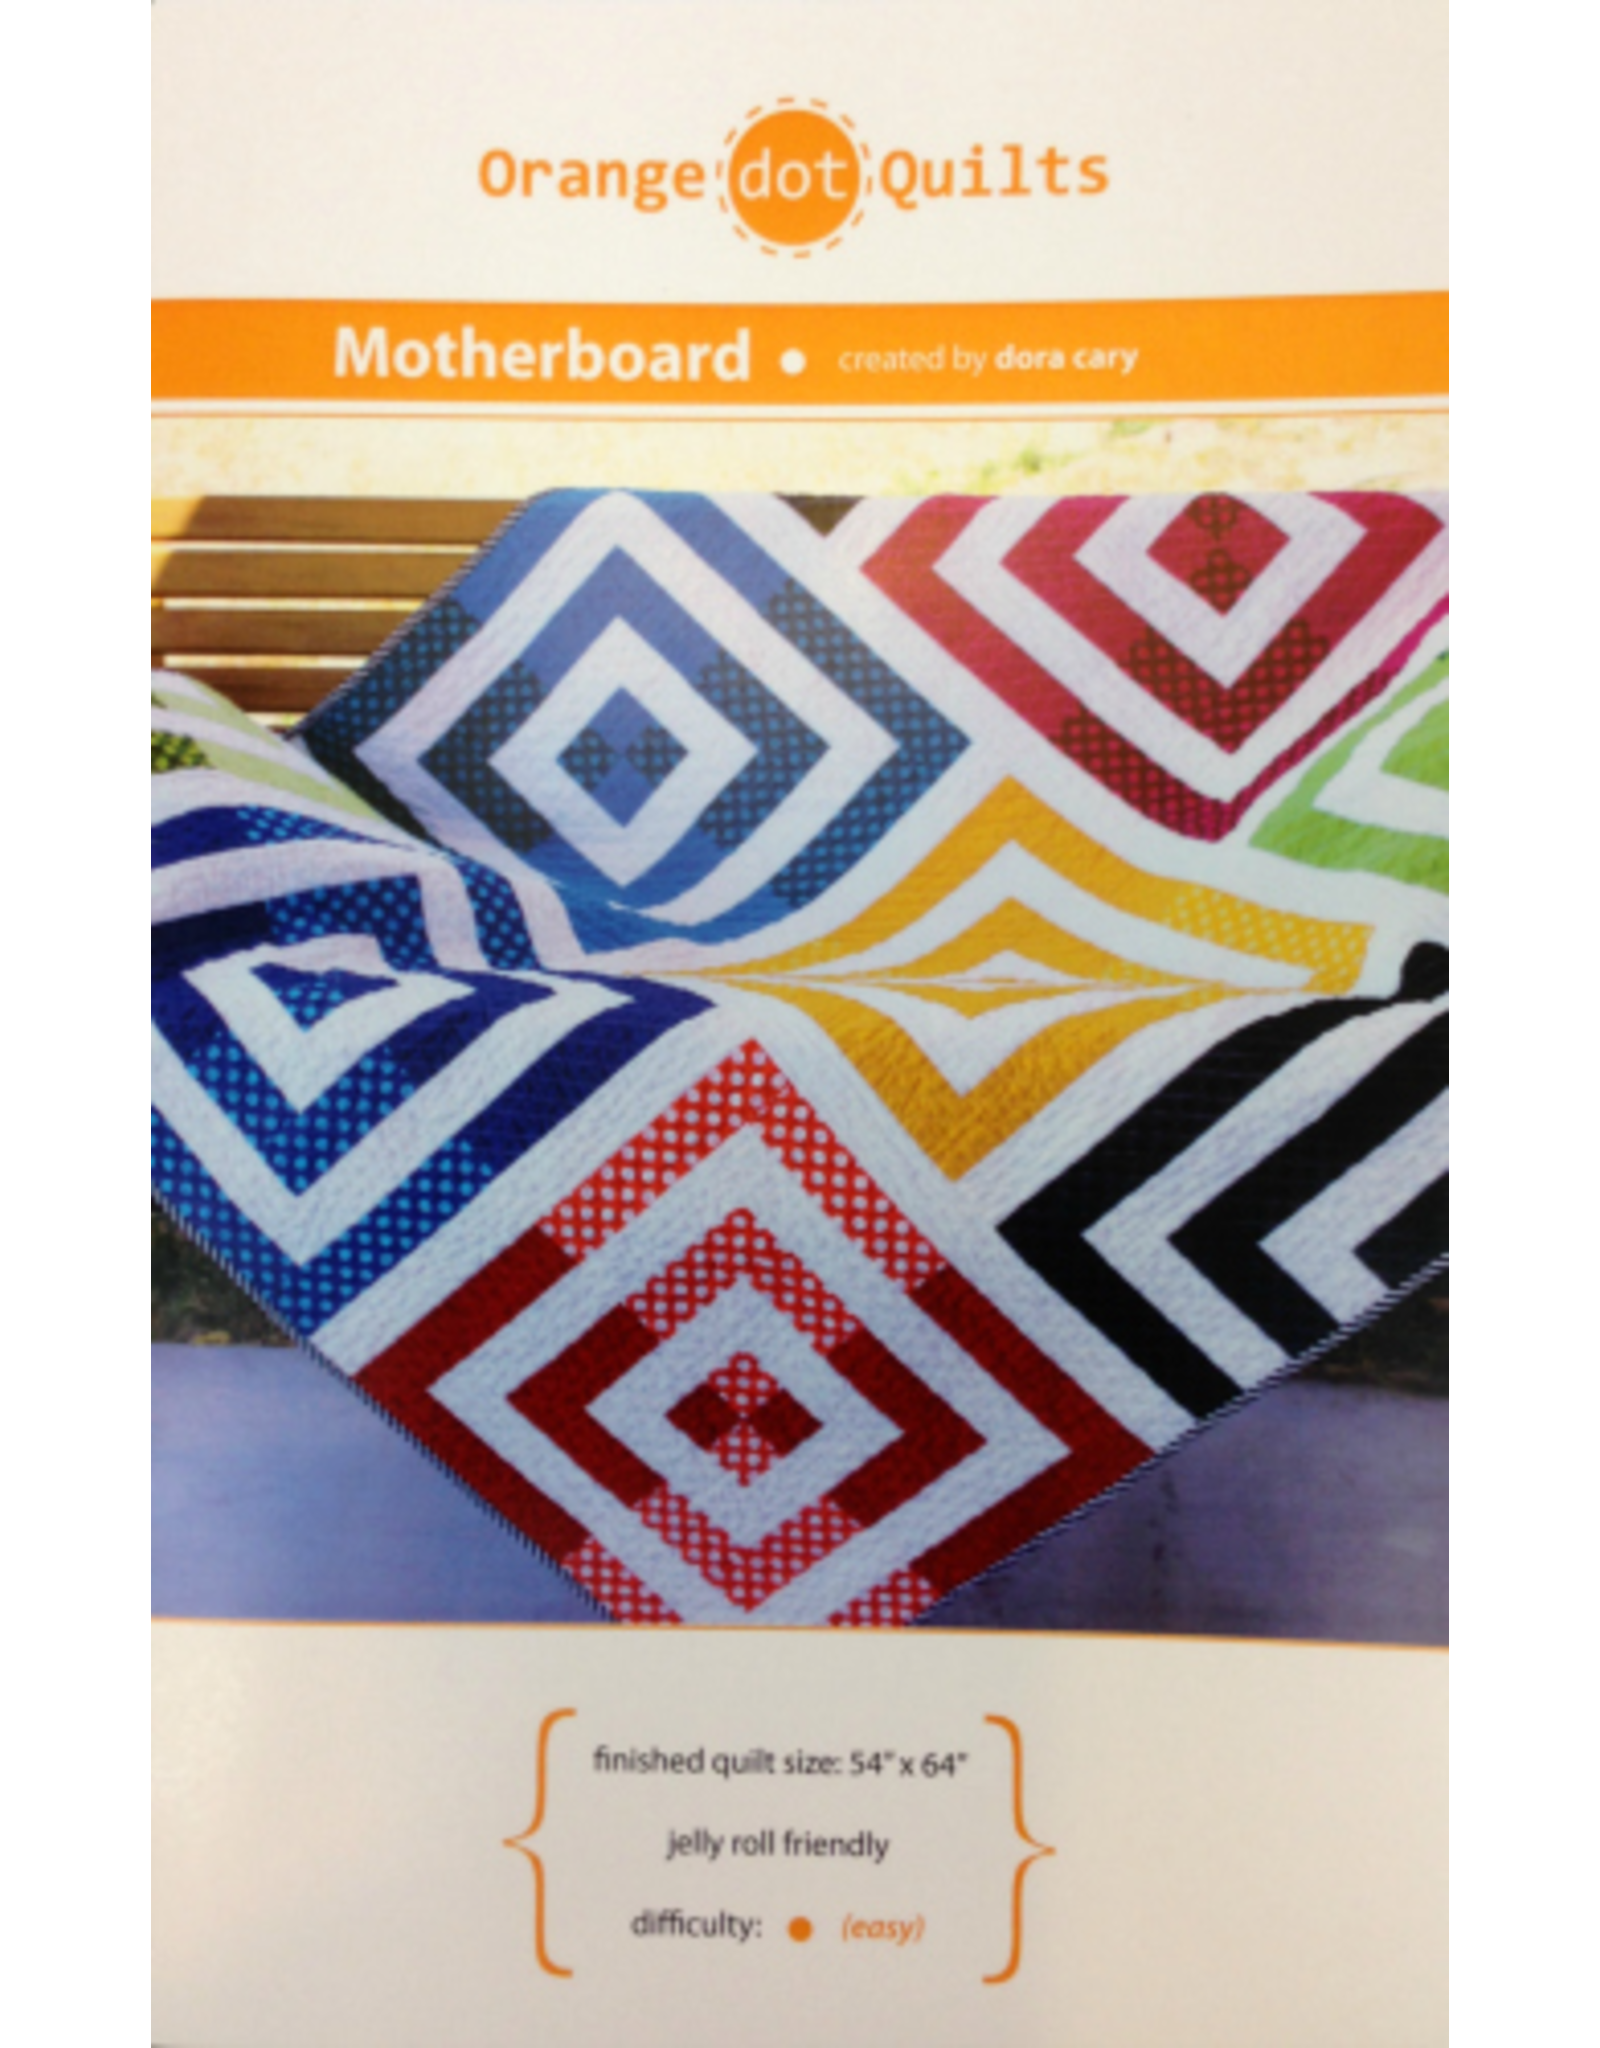 Orange Dot Quilts Motherboard Quilt Pattern